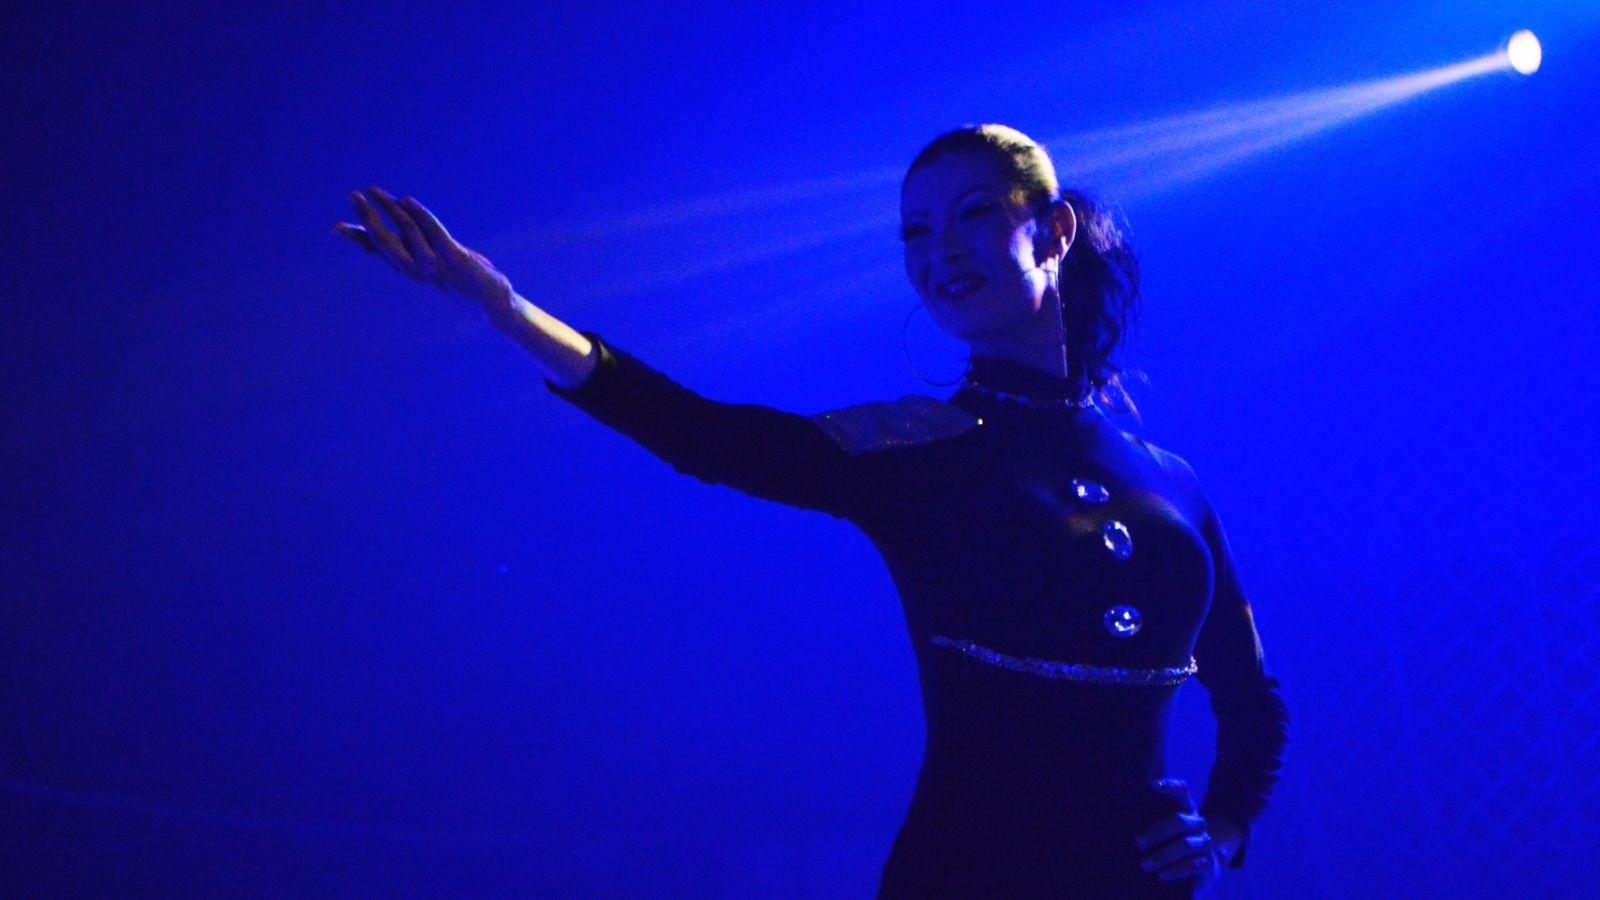 Bailarina venezolana encontró en circo de Bogotá un escape a la crisis